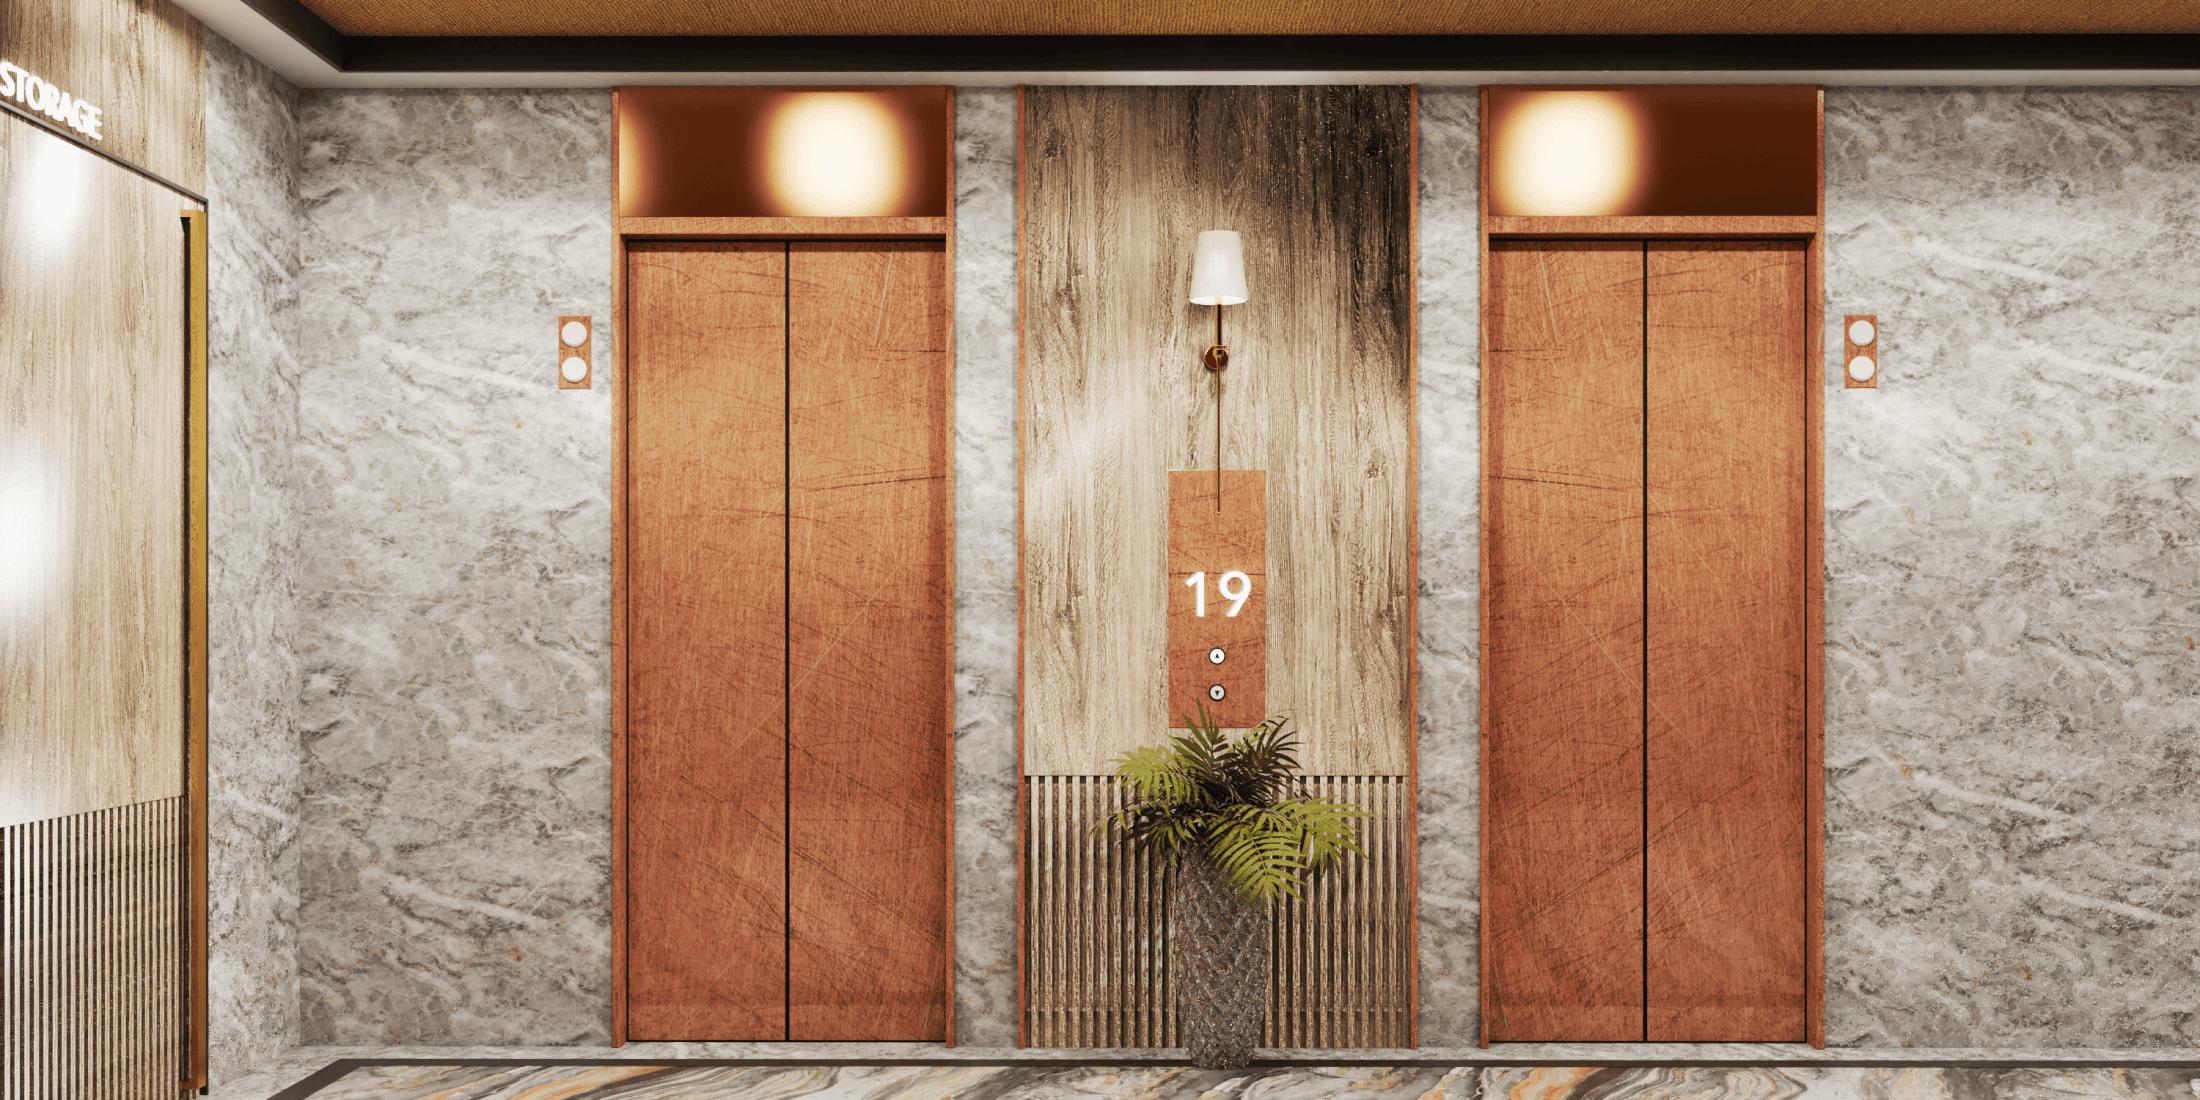 "Architecture Interior Workspace ""19Th"" Entrance Jakarta Selatan, Kota Jakarta Selatan, Daerah Khusus Ibukota Jakarta, Indonesia Jakarta Selatan, Kota Jakarta Selatan, Daerah Khusus Ibukota Jakarta, Indonesia Architecture-Interior-Workspace-19Th-Entrance  87665"